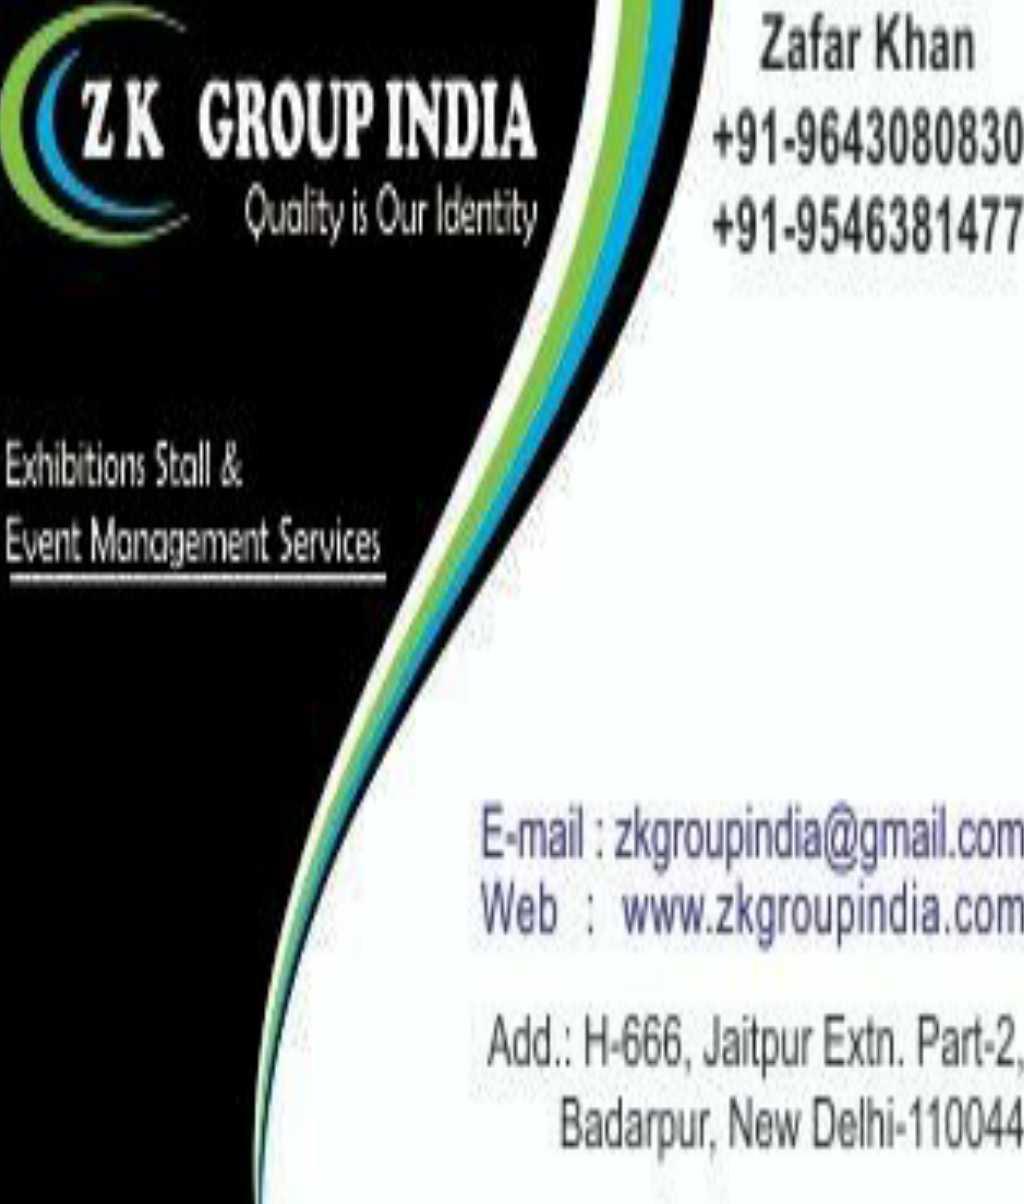 ZK GROUP INDIA